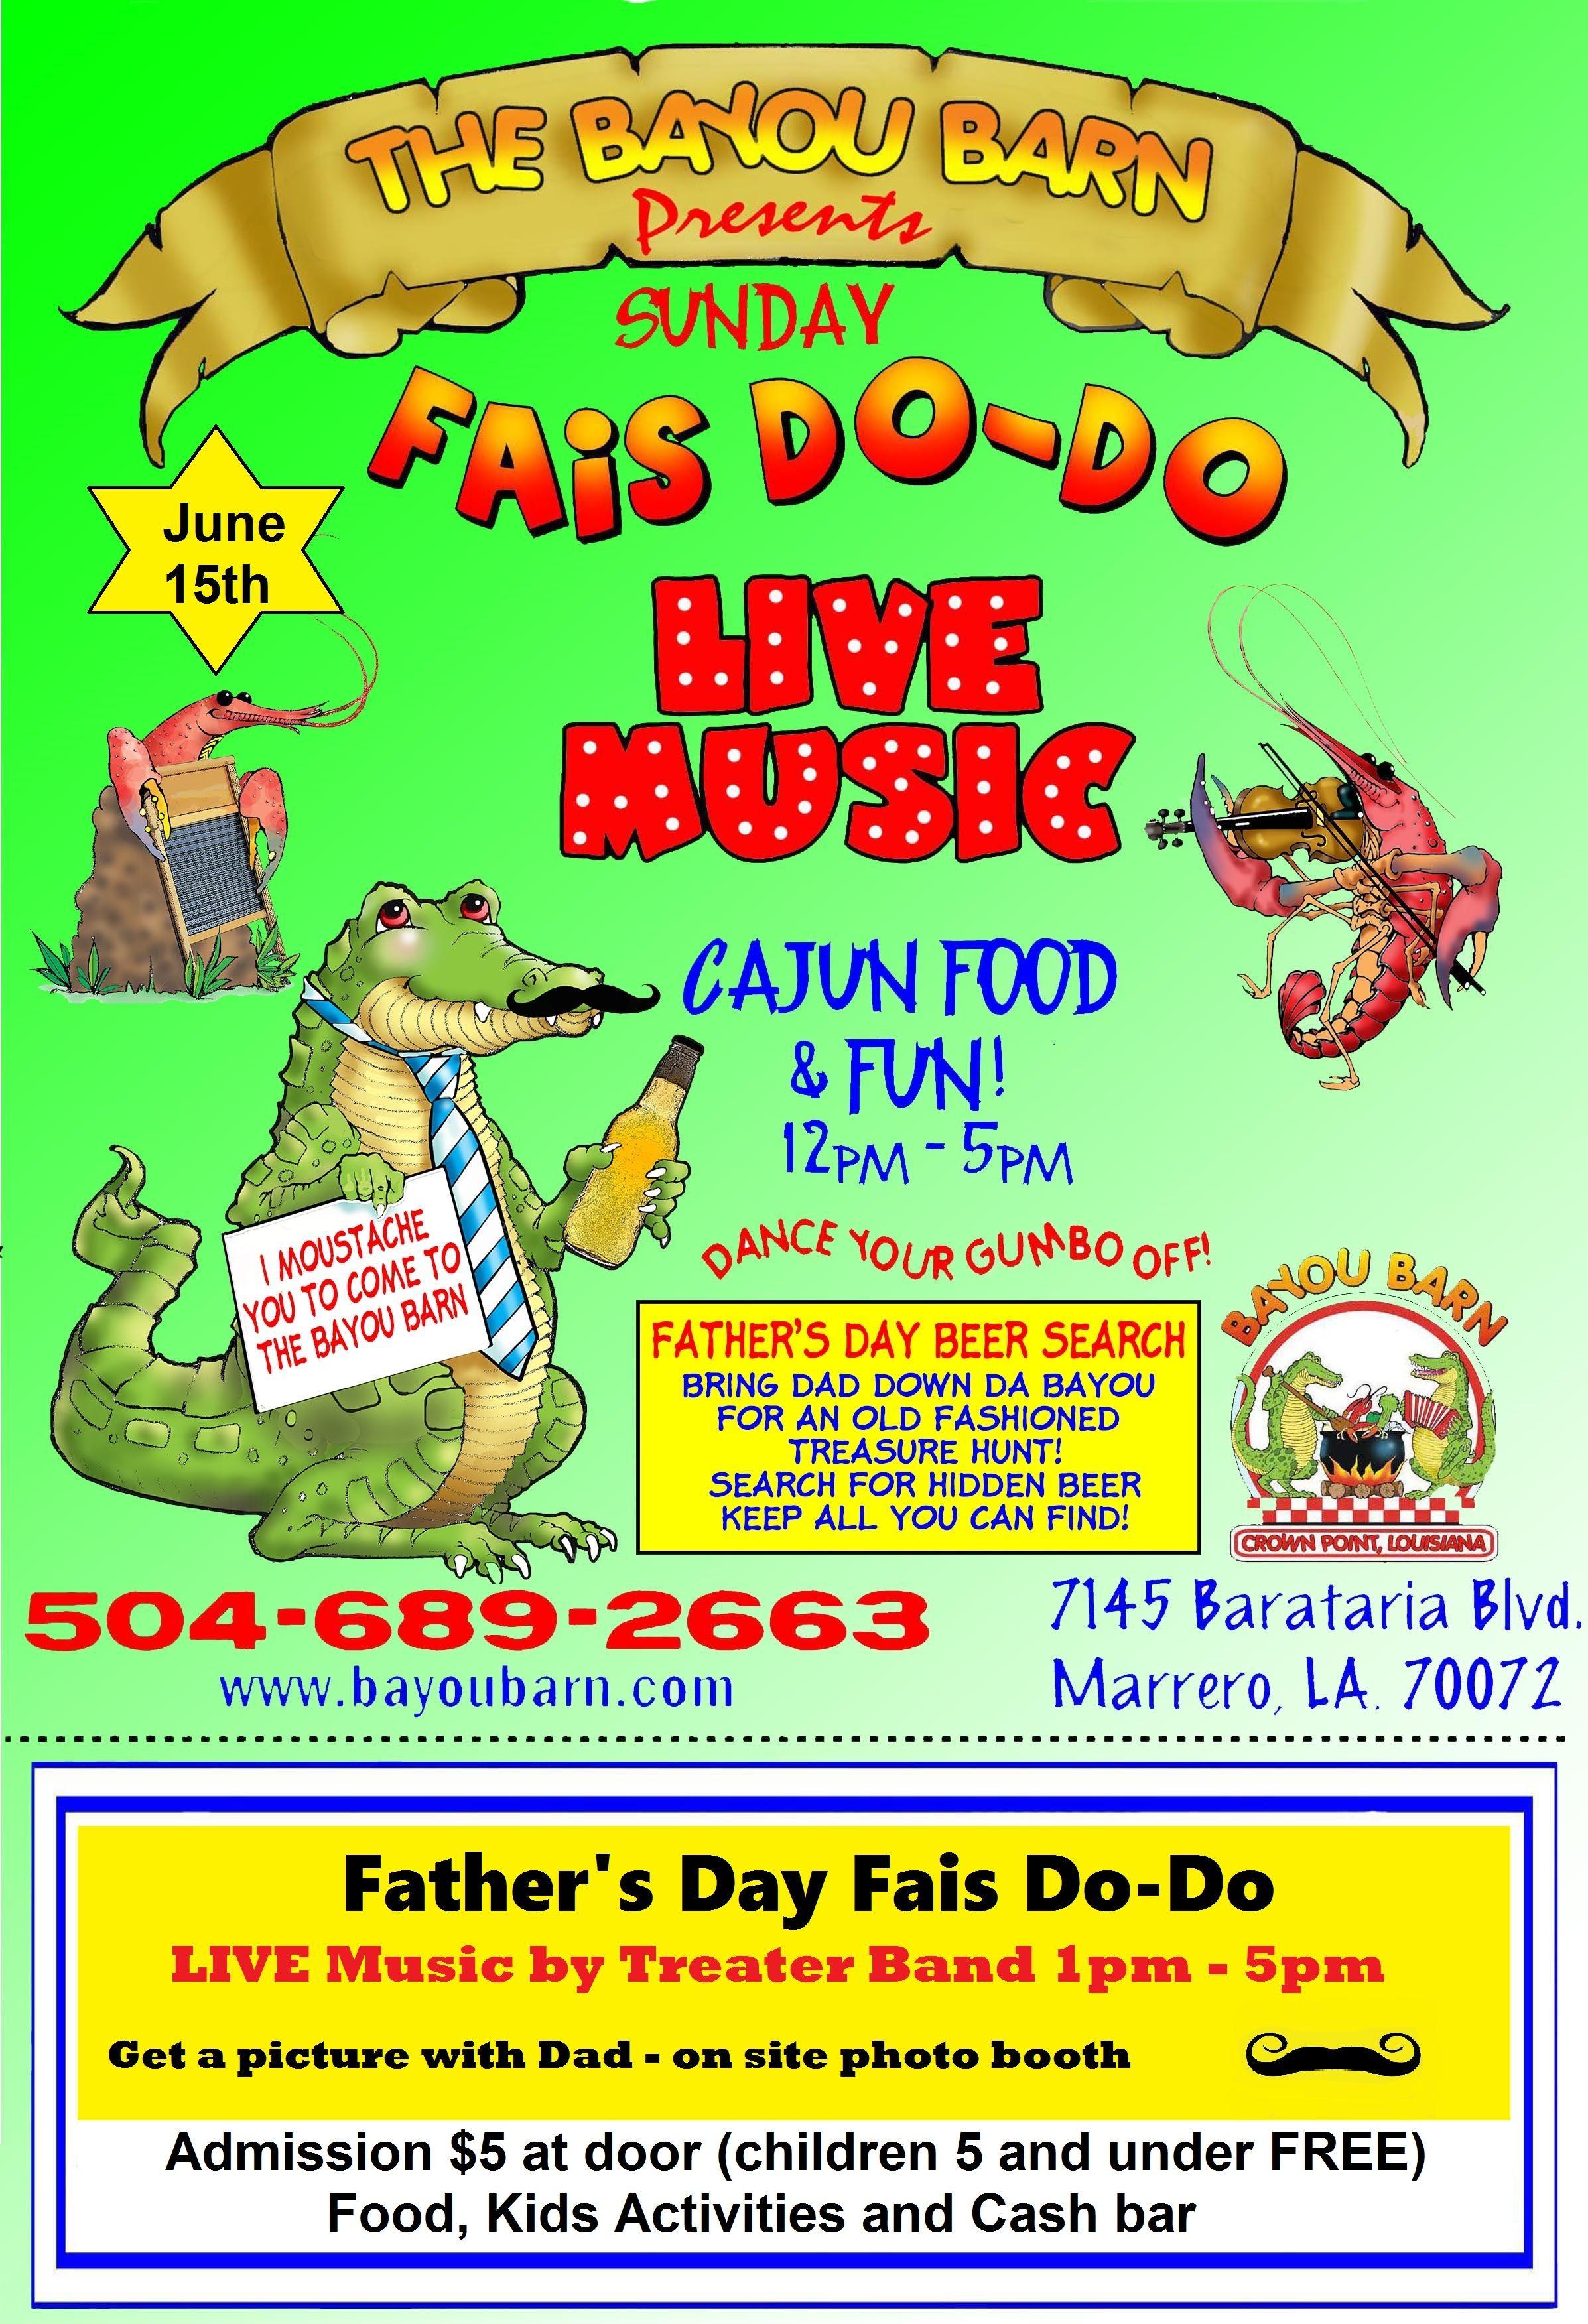 Bayou Barn Father's Day Fais Do-Do - Jefferson Parish Events Calendar | Jefferson, Louisiana